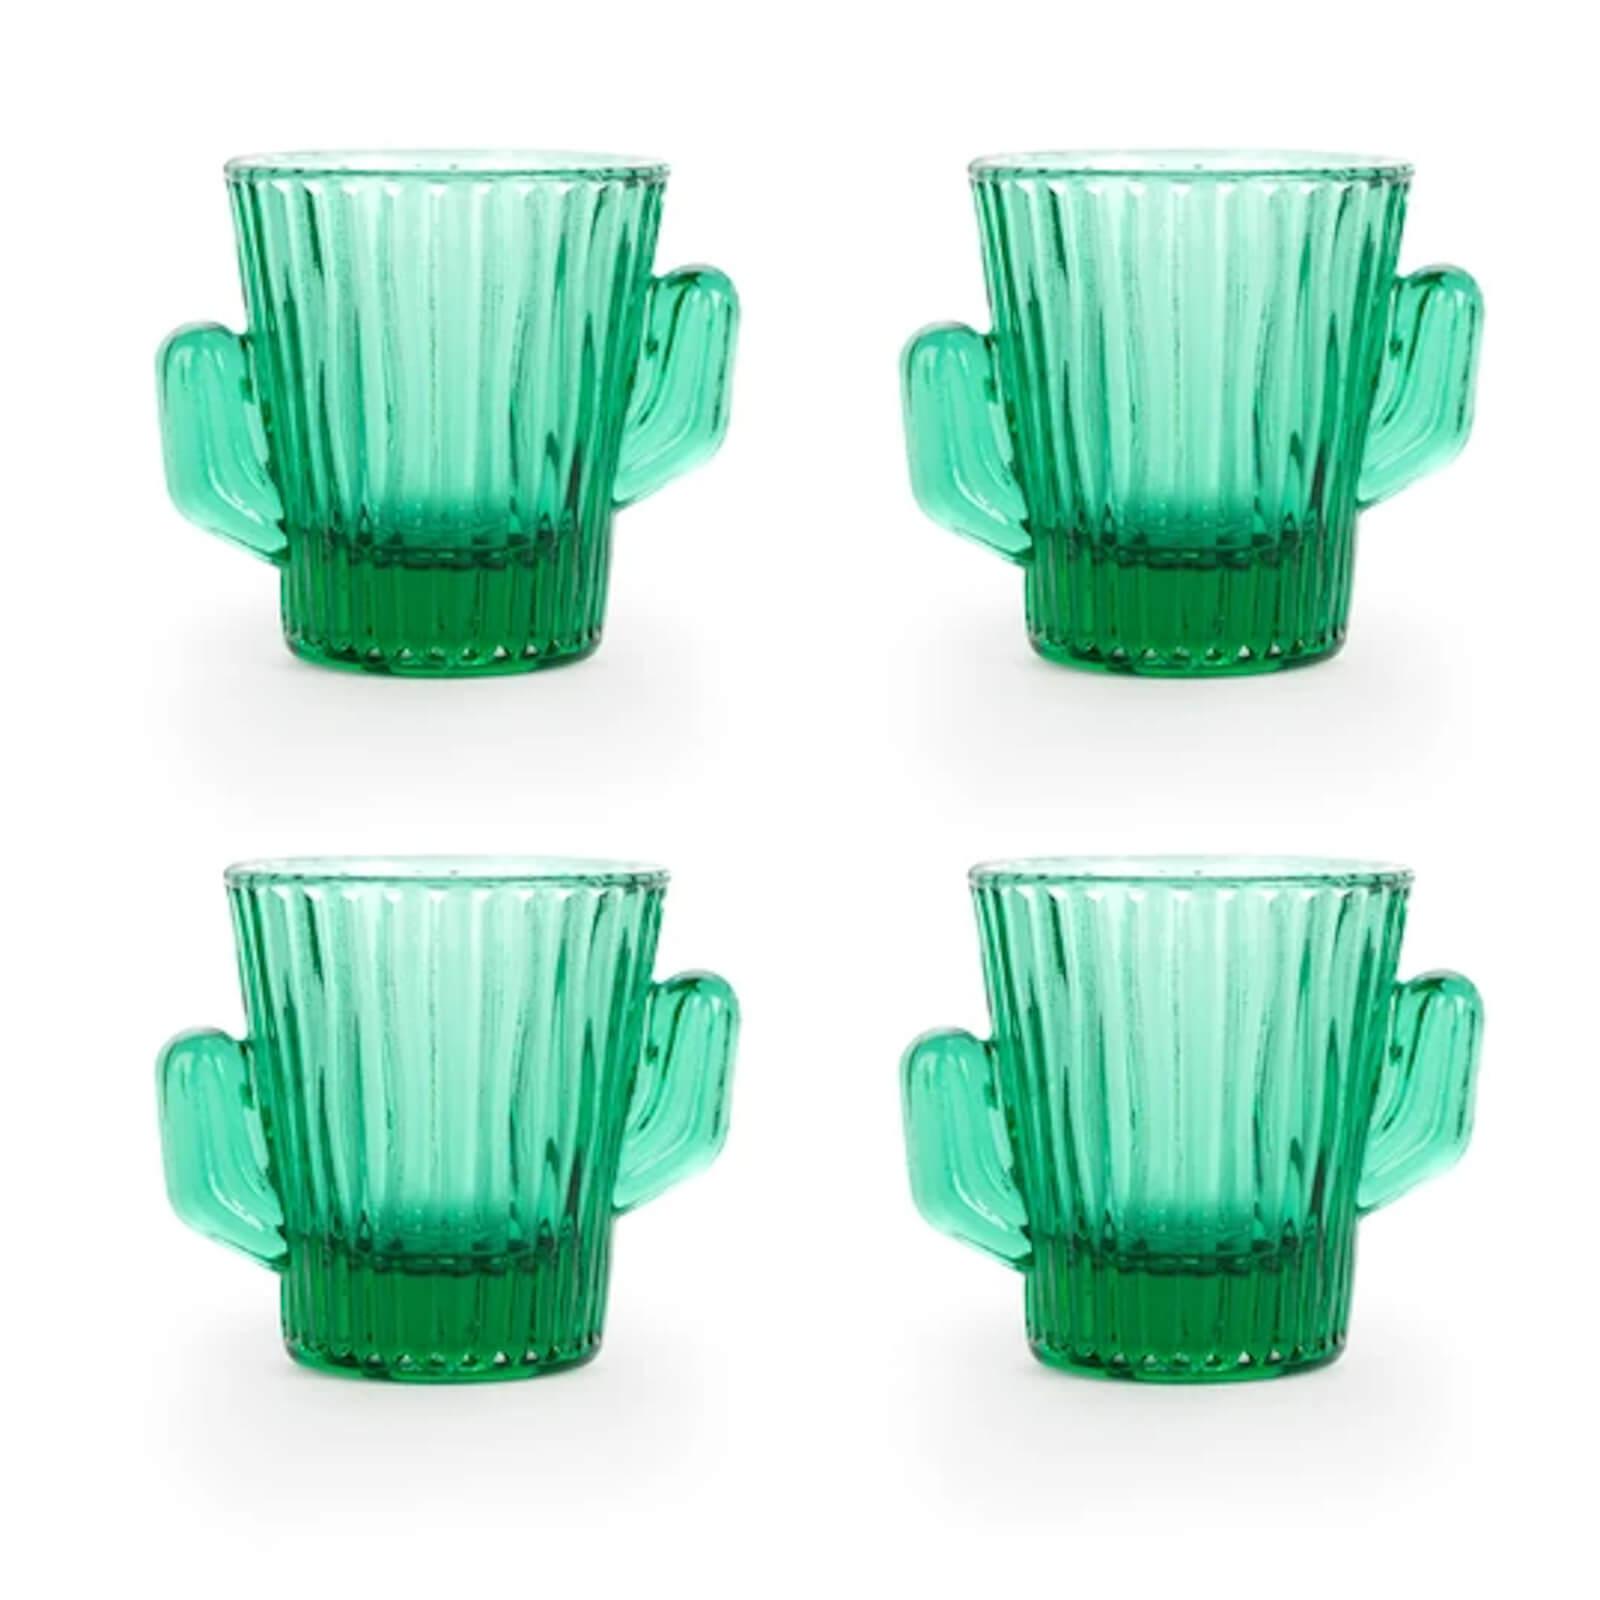 Image of Cactus Shot Glasses